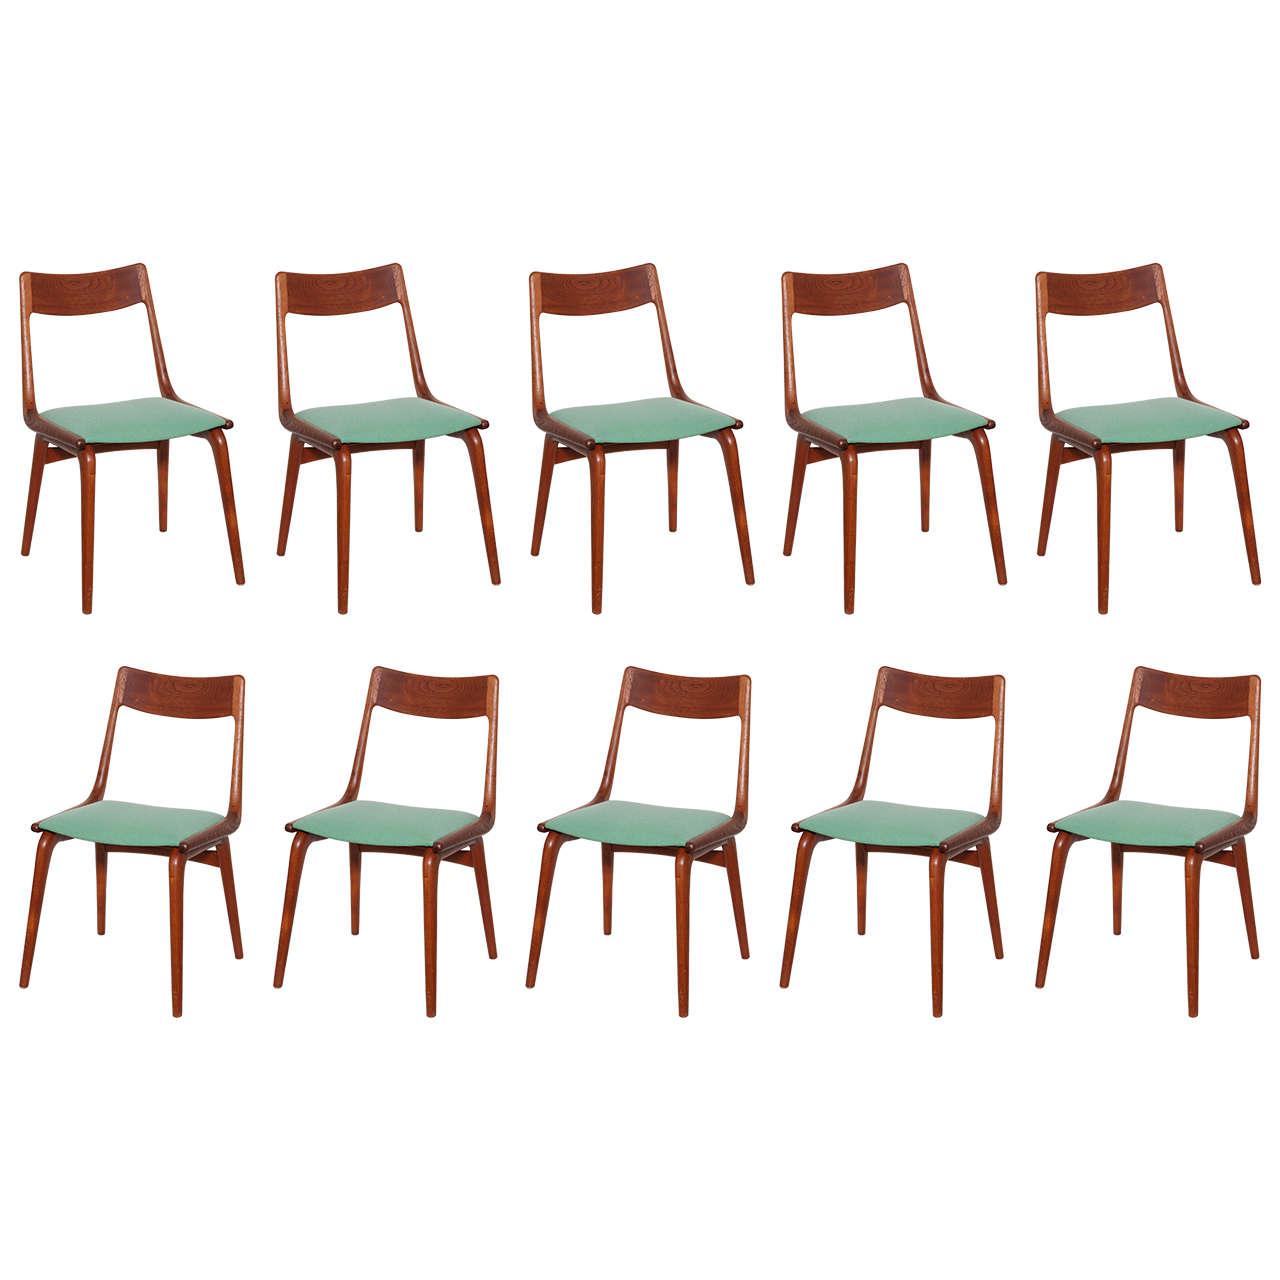 Boomerang Chairs by Erik Christiansen Set of 10 at 1stdibs